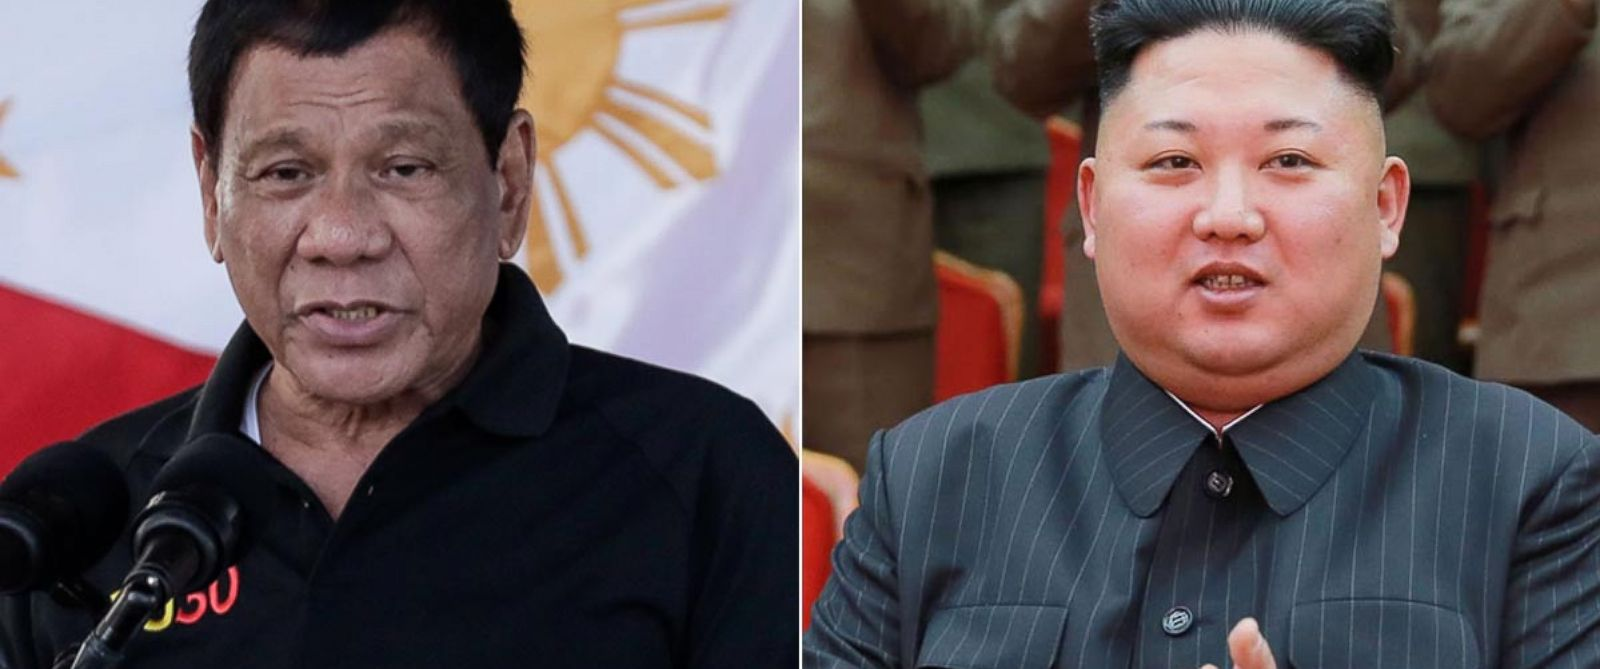 PHOTO: Philippine President Rodrigo Duterte in the province of Bukidnon, Northern Mindano, Philippines, on March 25, 2017 | North Korean leader Kim Jong-Un in Pyongyang, on Feb. 22, 2017.